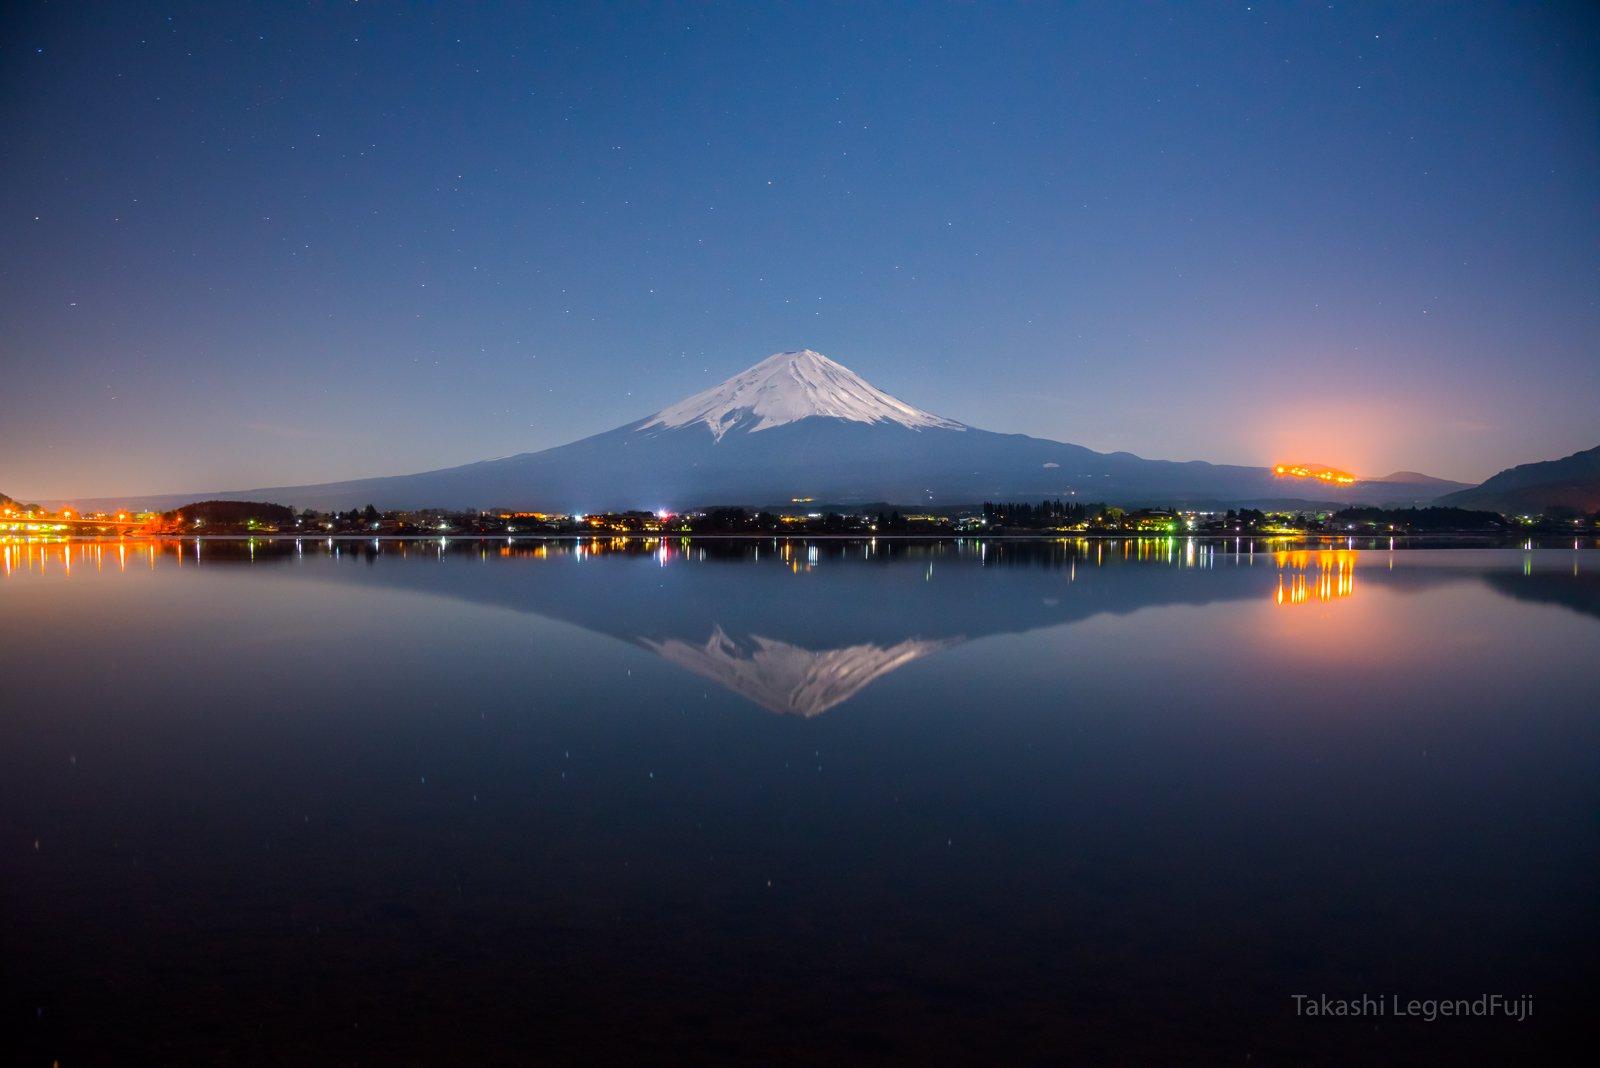 Fuji,mountain,Japan,night,lake,water,moon,reflection,beautiful,snow, Takashi